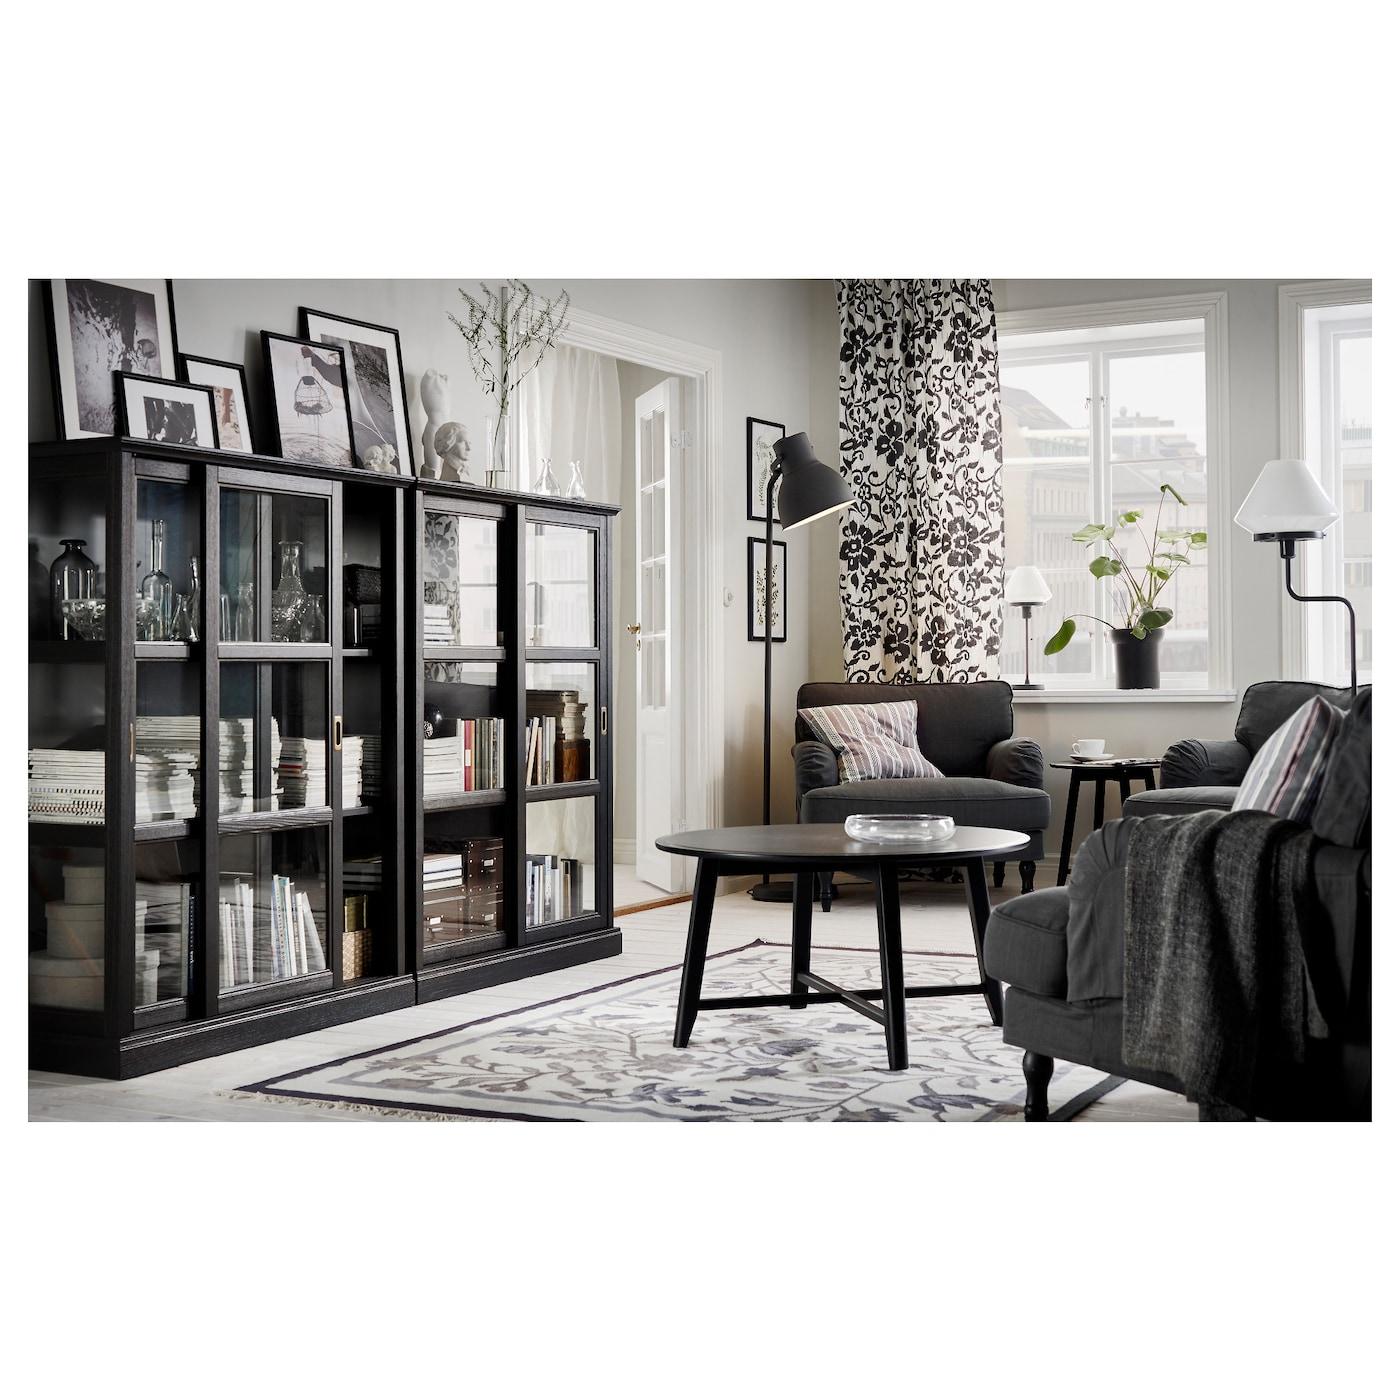 Penderie Ikea Portes Coulissantes ~ Floor lamp HEKTAR Dark grey